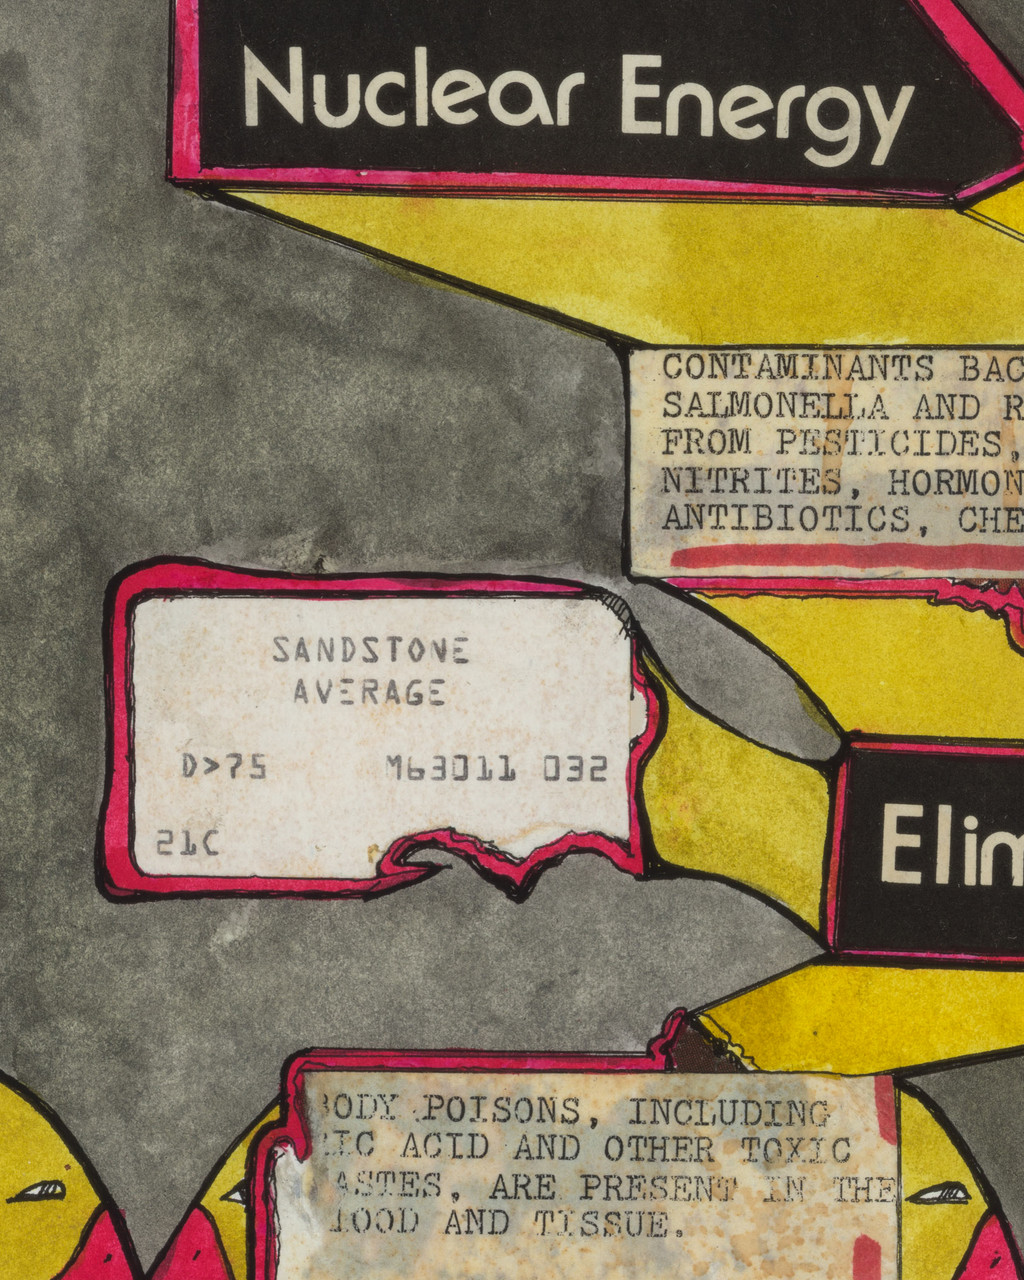 john evans march 16 1982